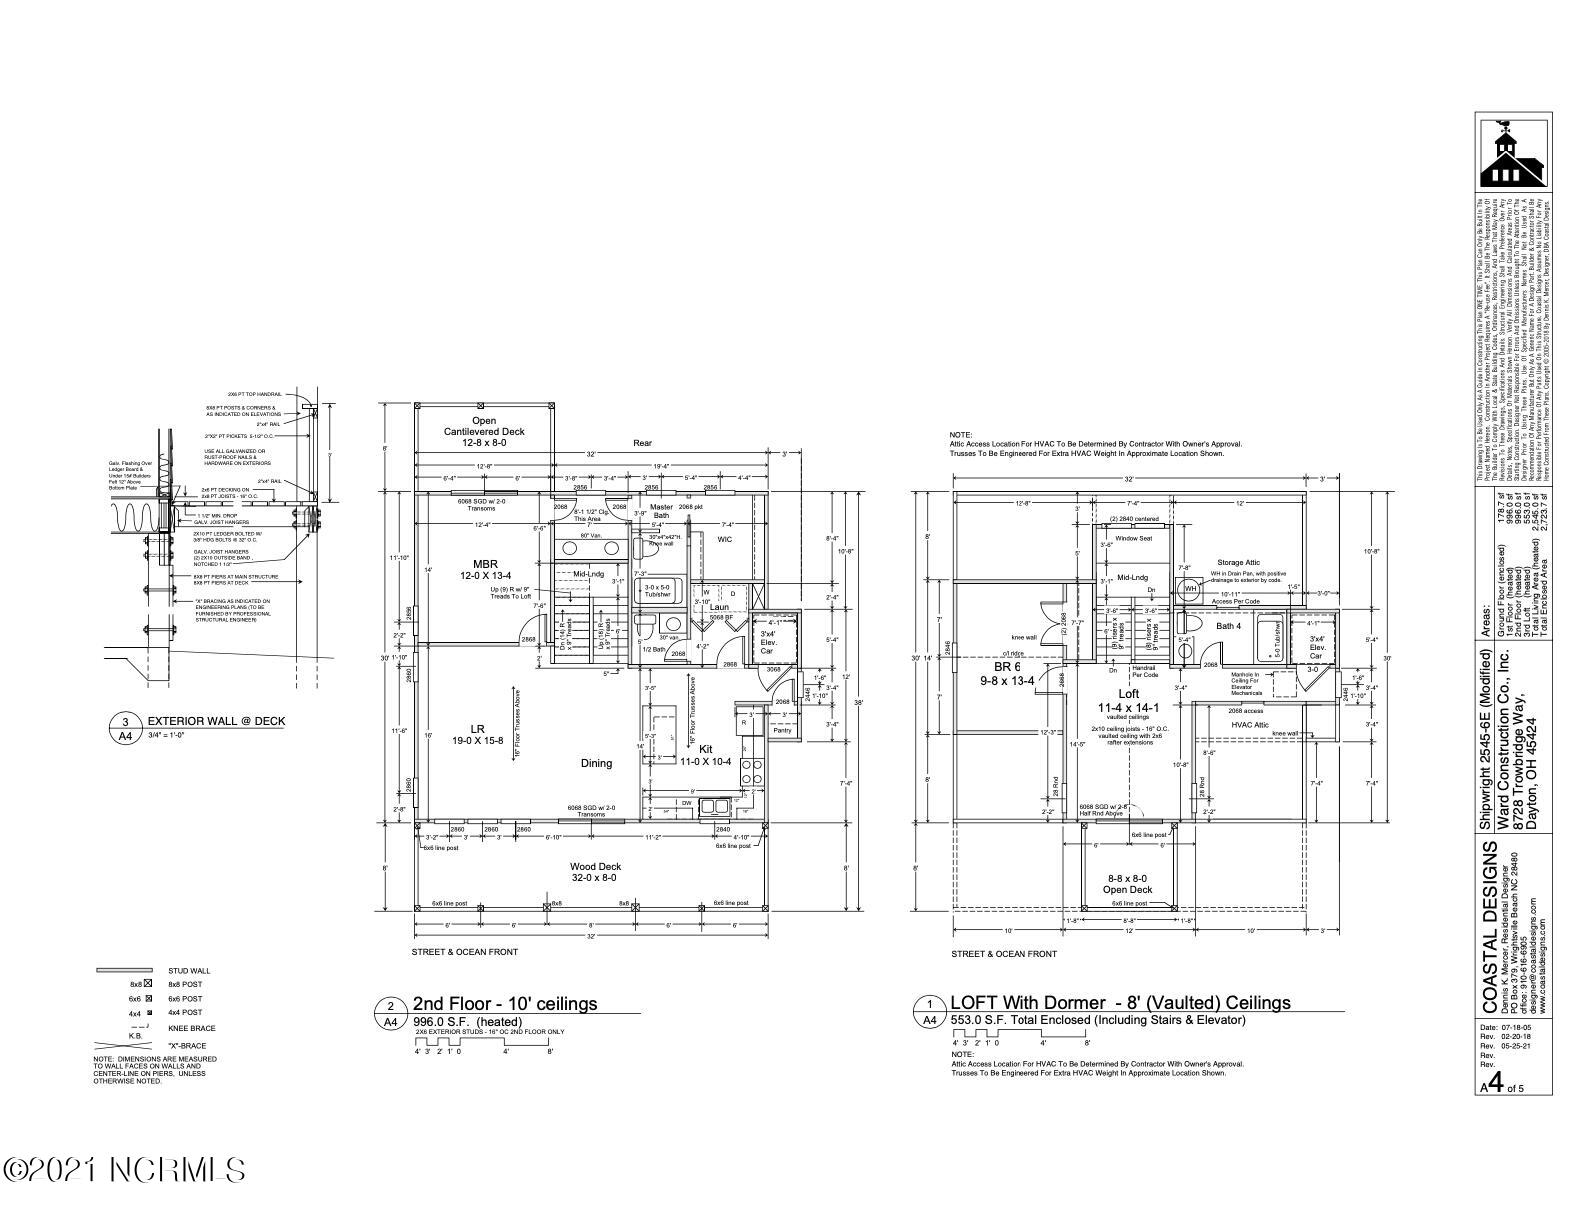 Floorplan Page 4